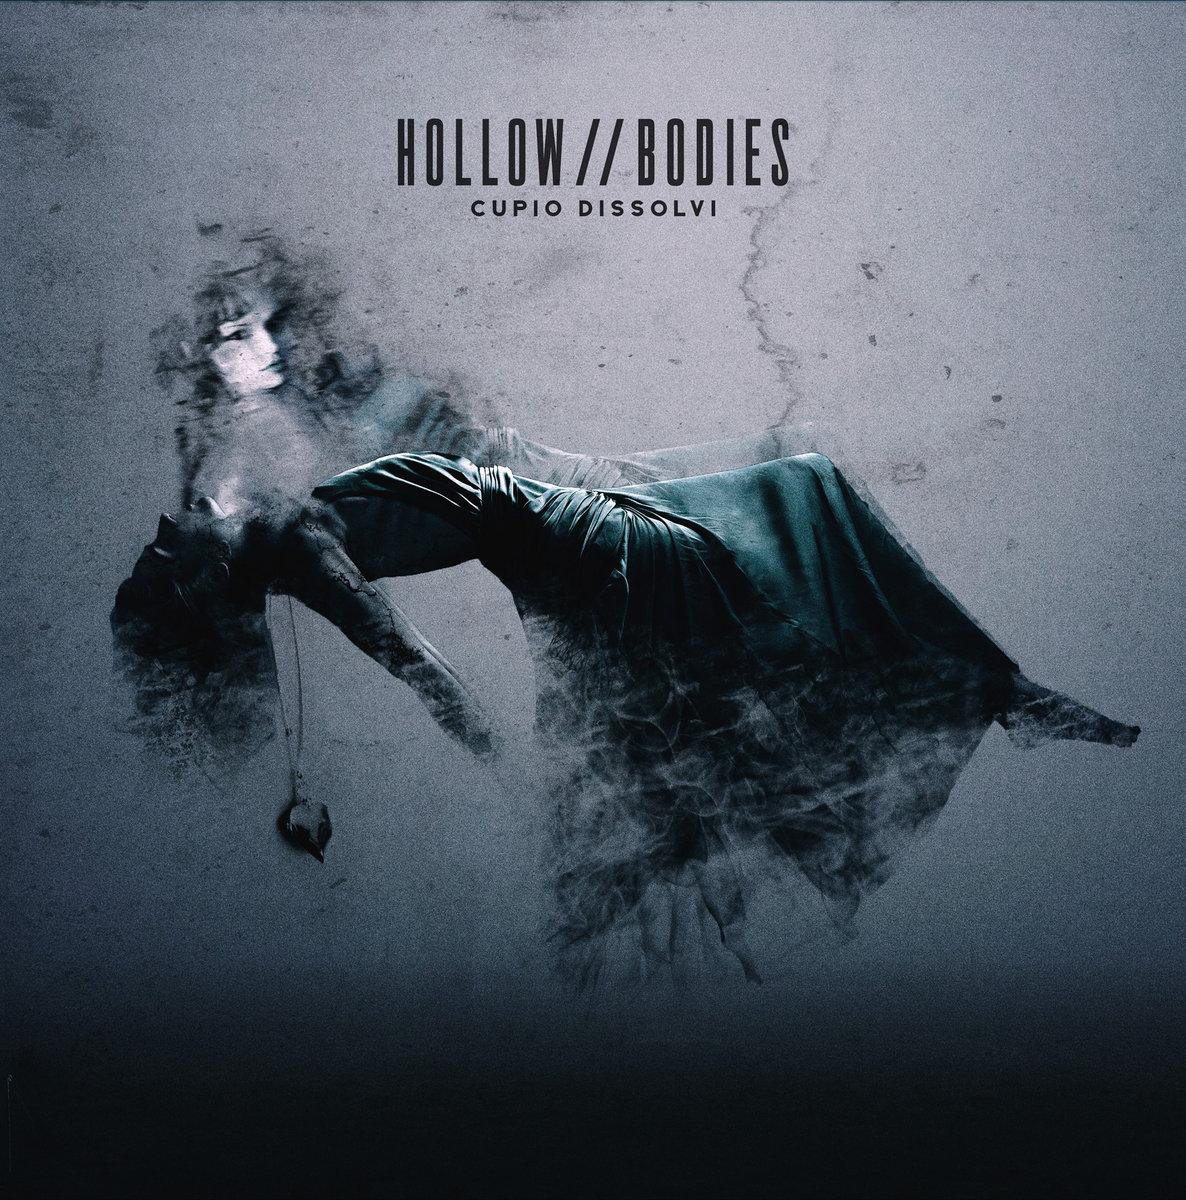 Hollow Bodies - Cupio Dissolvi [EP] (2017)